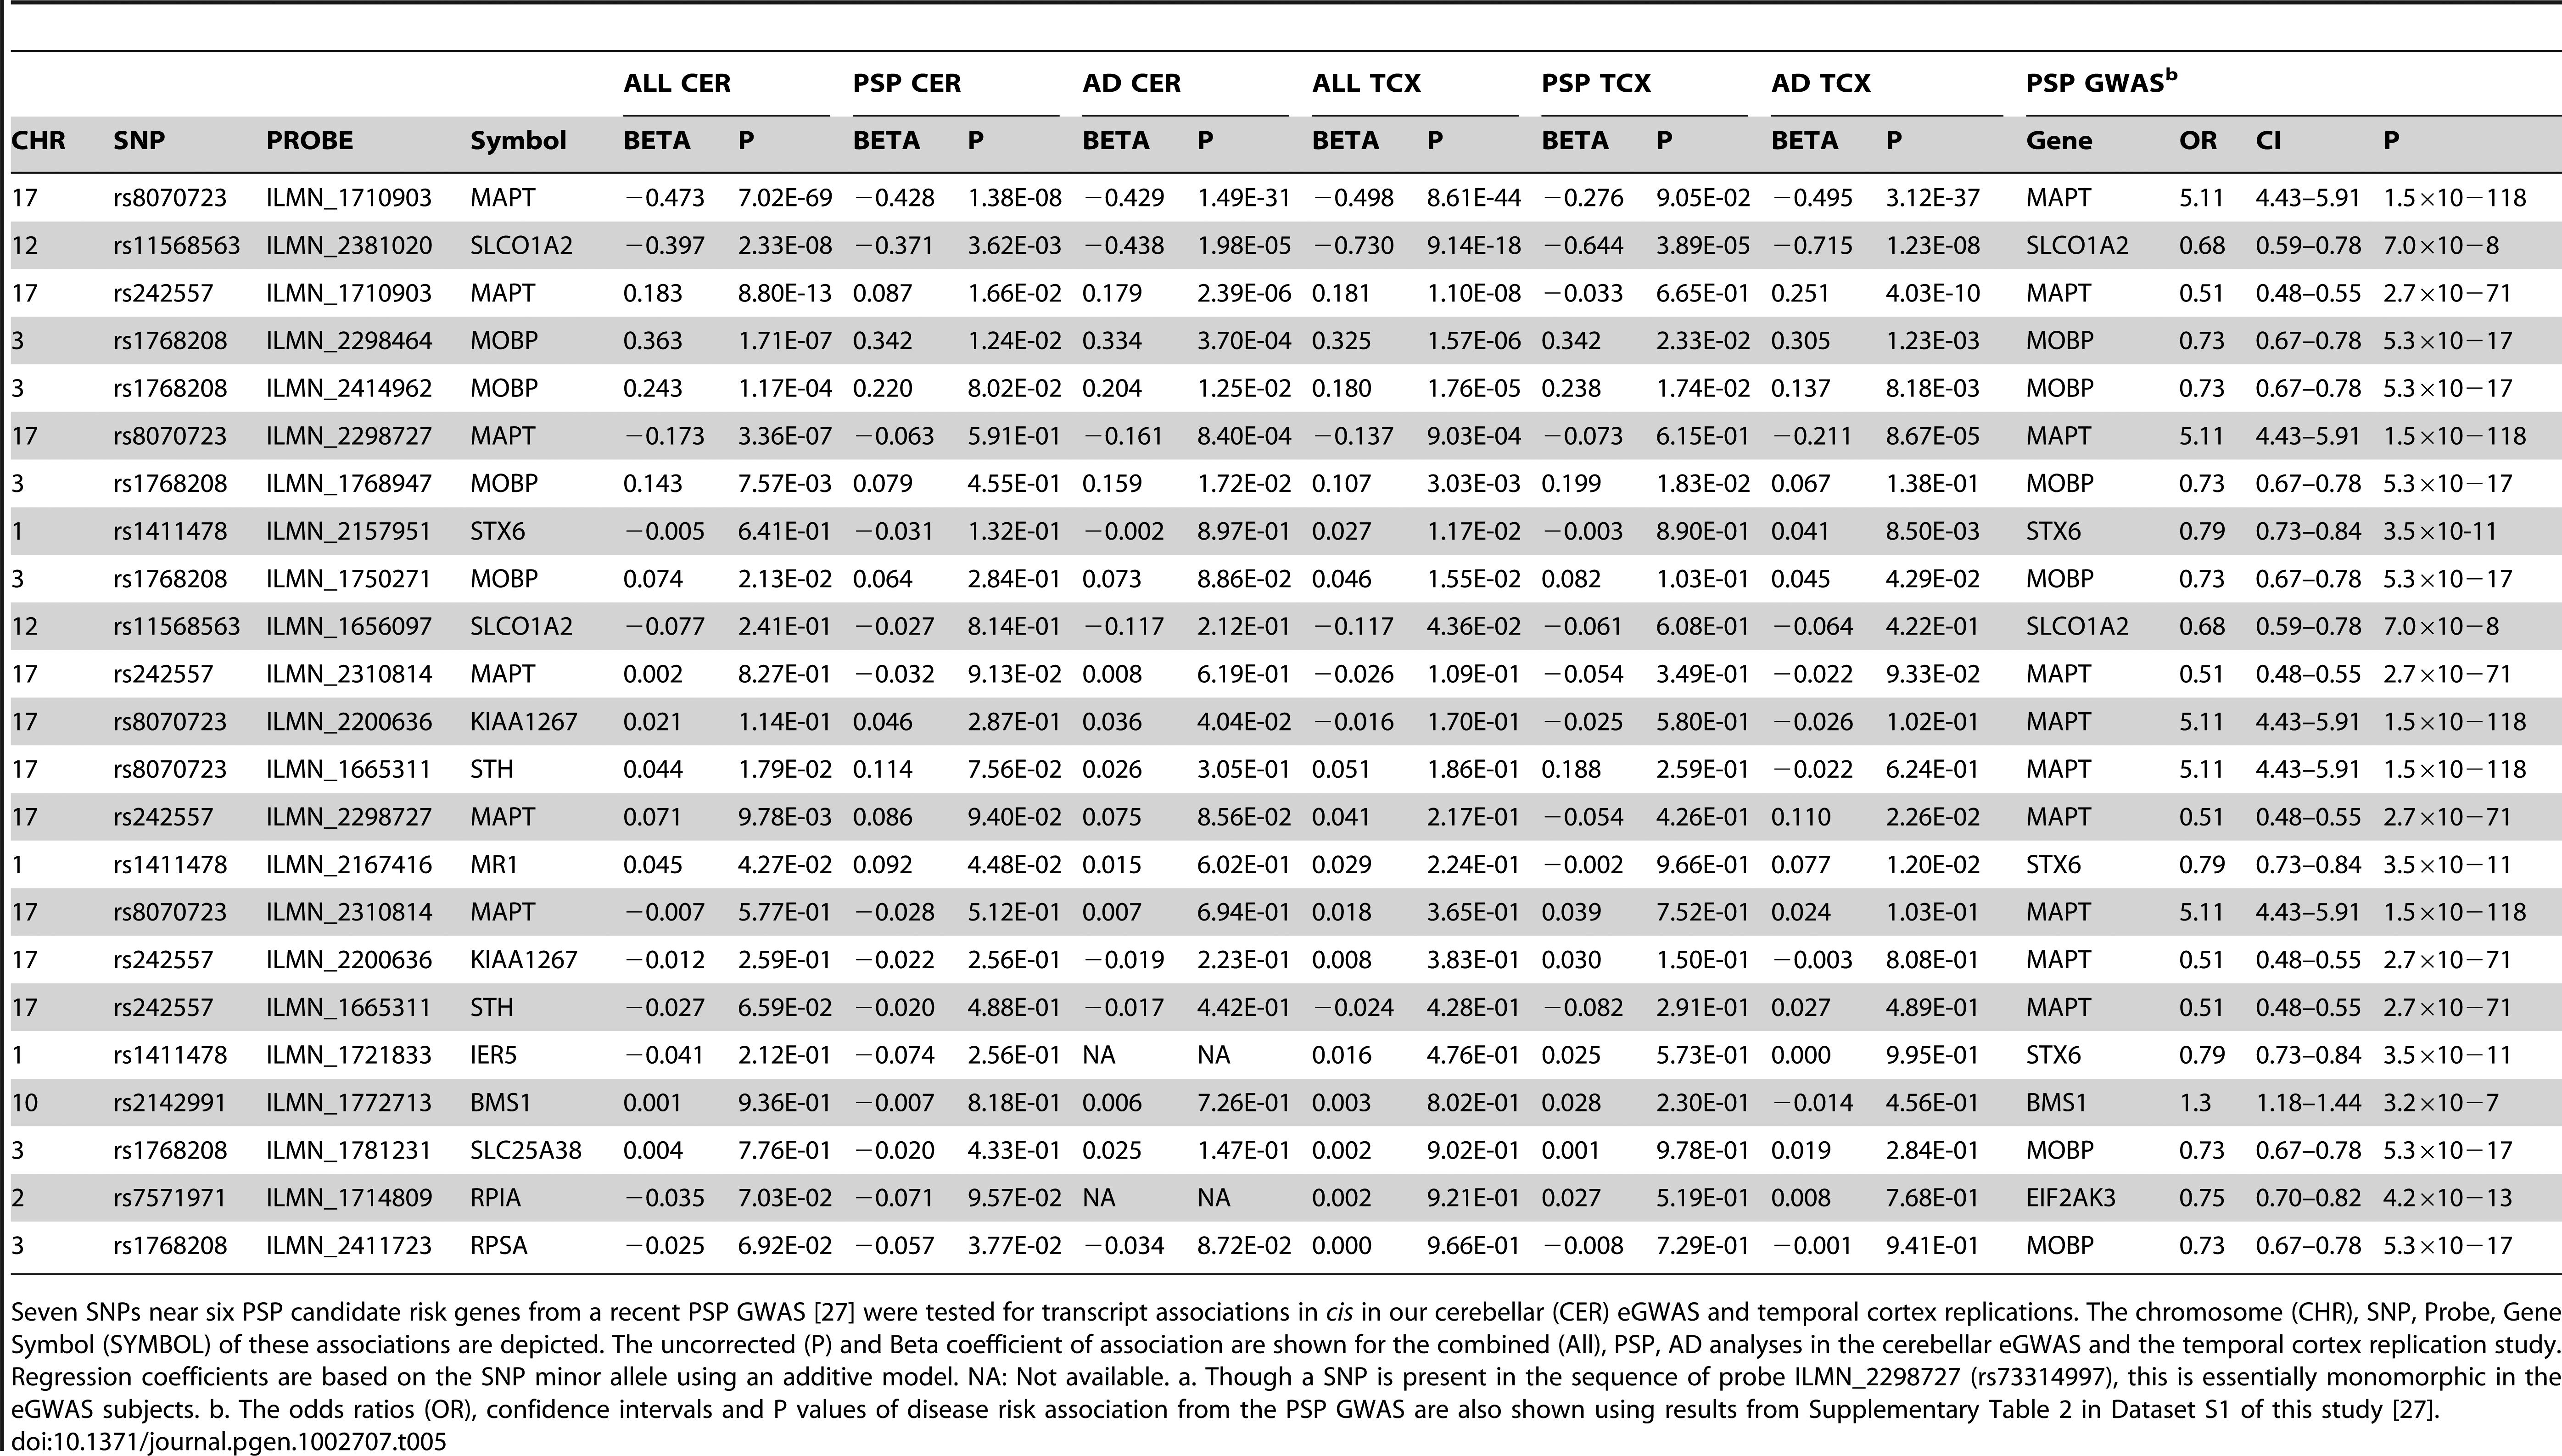 PSP GWAS <i>cis</i>SNP/transcript associations in the cerebellar and temporal cortex.